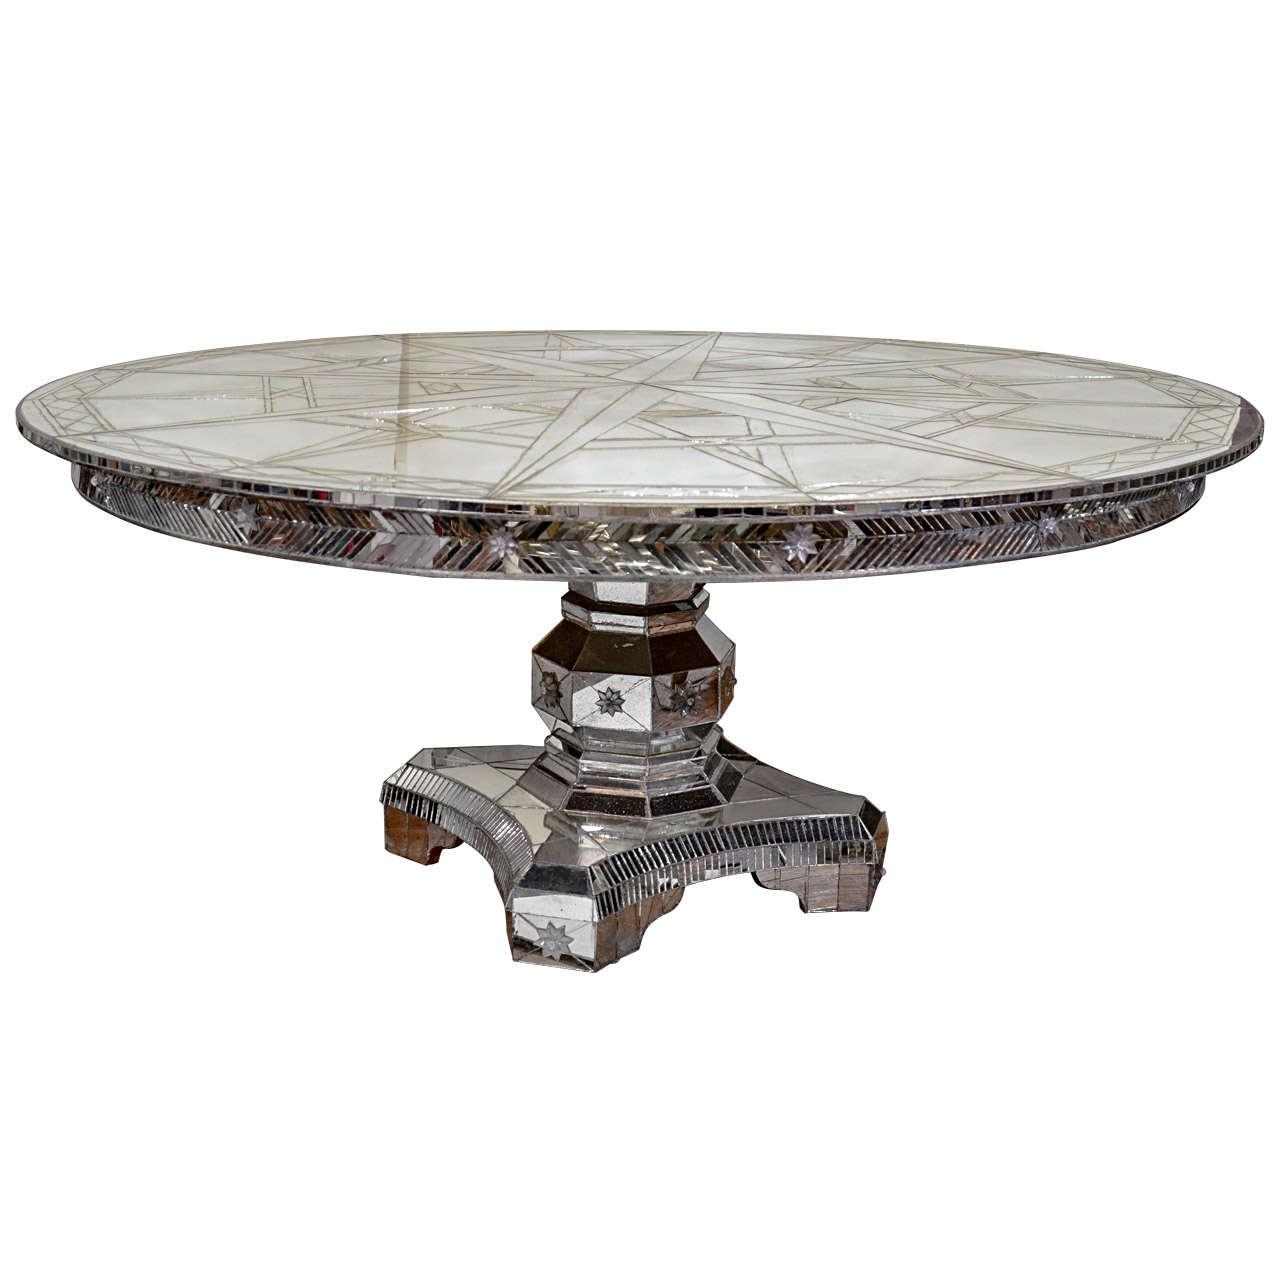 kitchen table sets target kitchen table sets target ikea kitchen table sets target with set for sale used